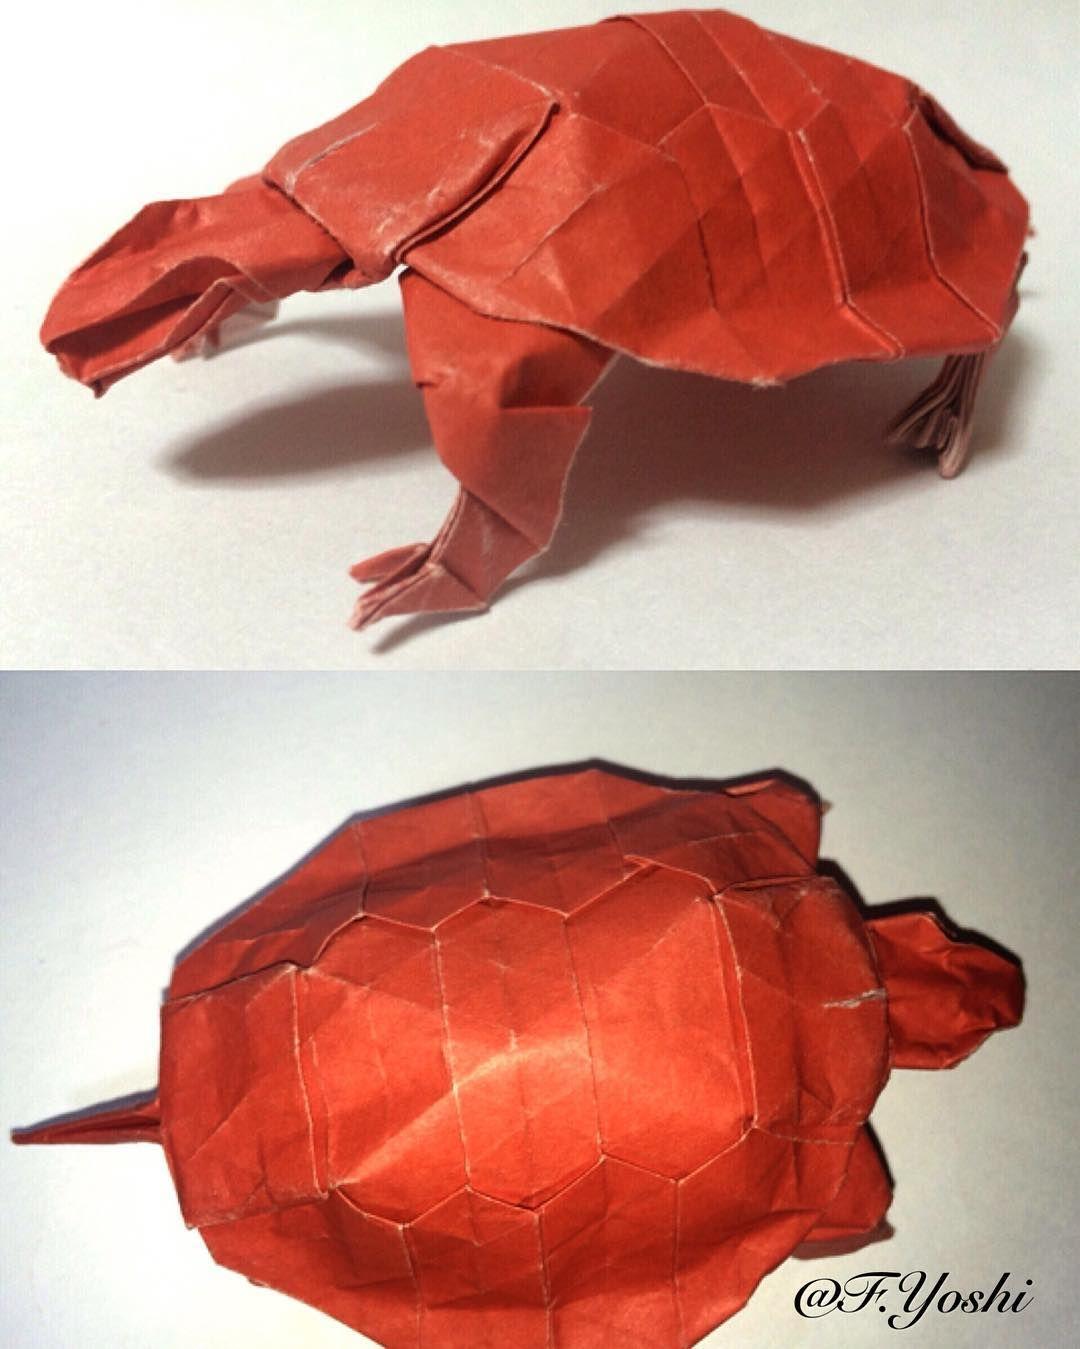 Instagram Photo By Fumiya Yoshidome May 11 2016 At 7 51pm Utc Turtle Design Turtle Pond Paper Crafts